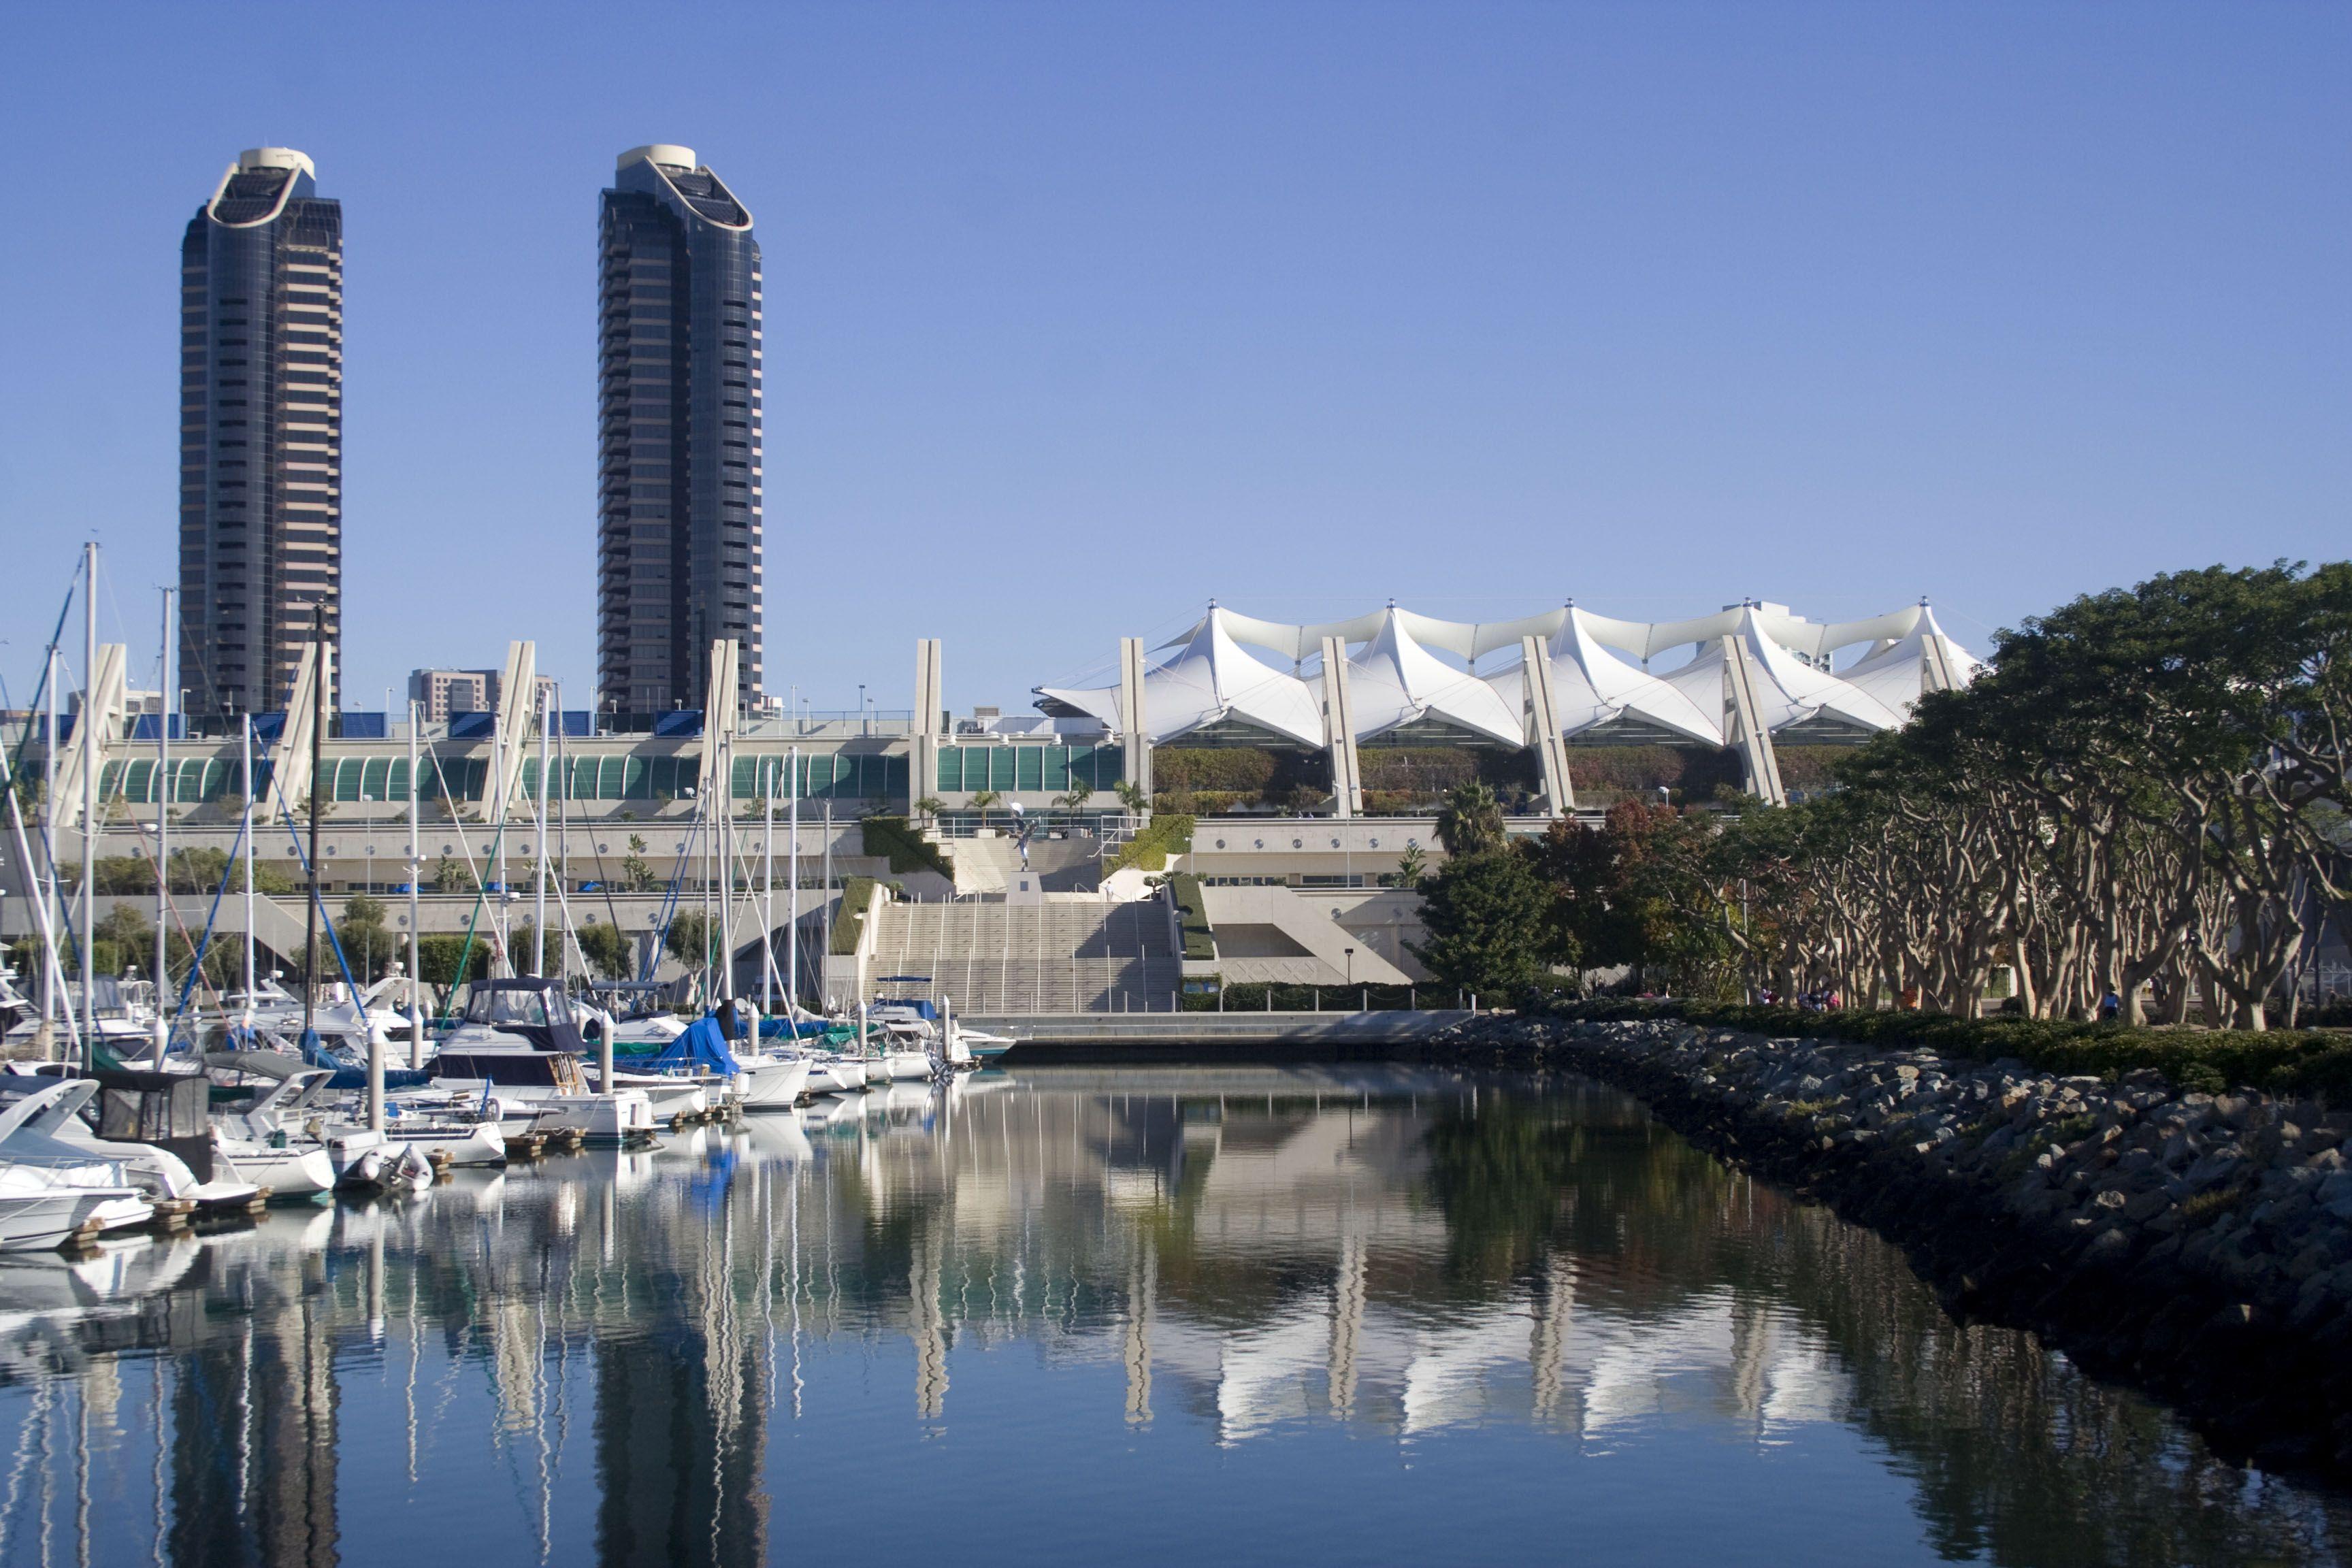 San Diego Convention Center Car Show